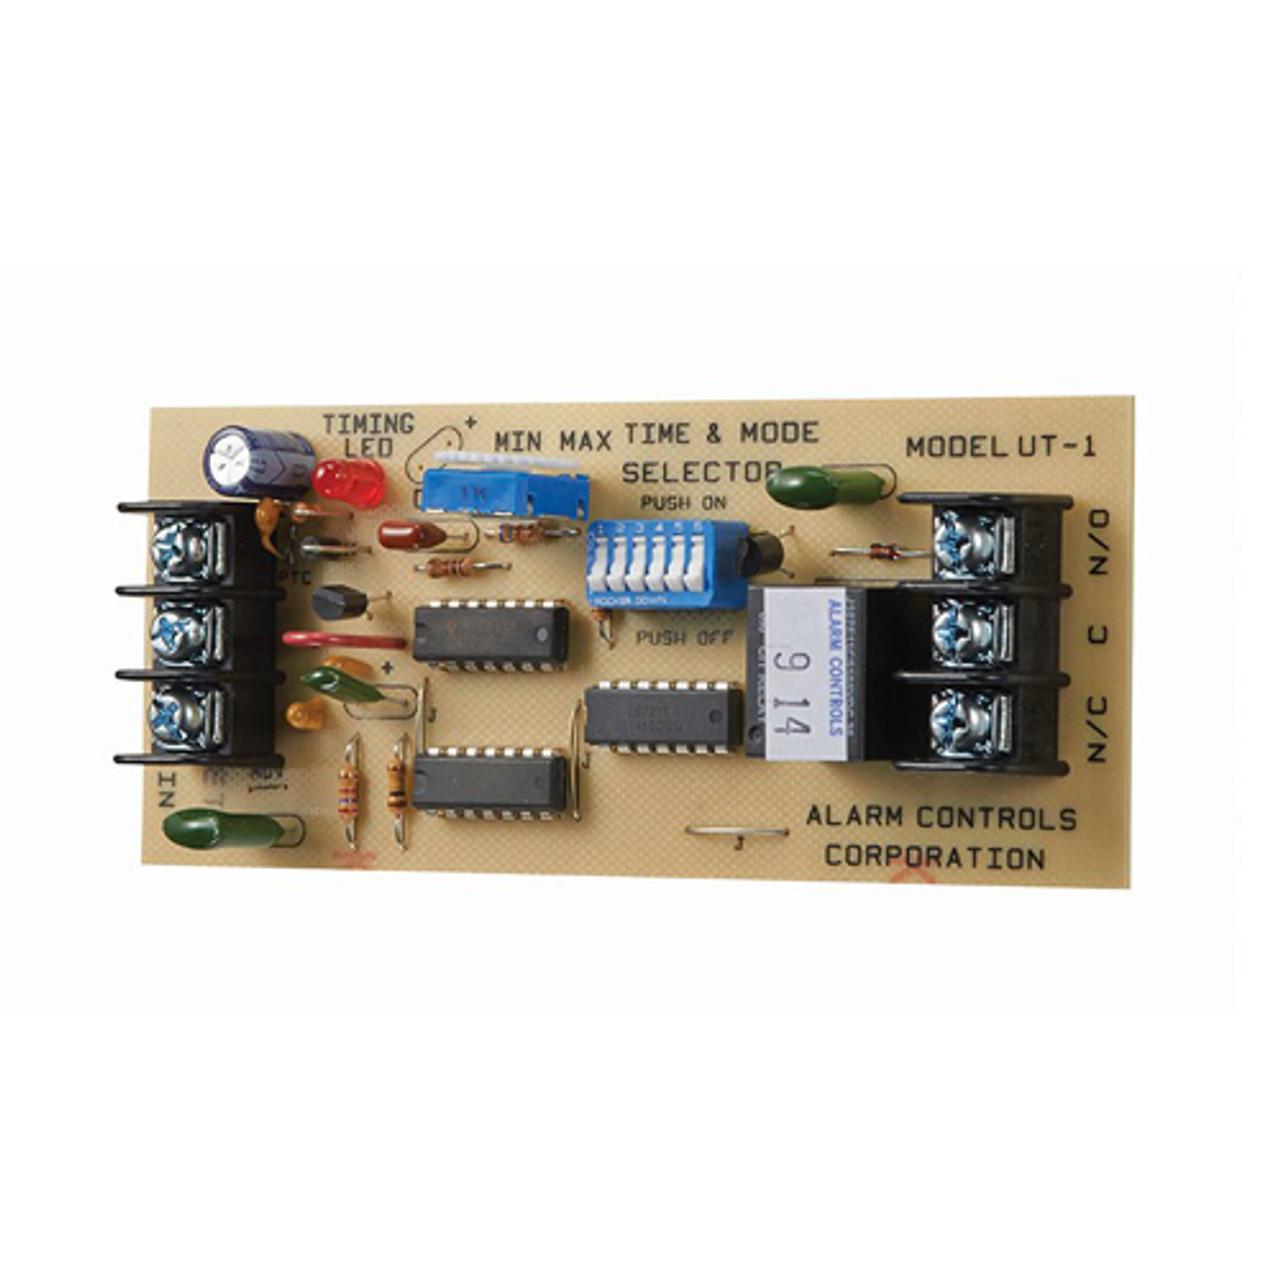 ASP-UT-1-24V ASP Alarm Control Programmable Digital Timer